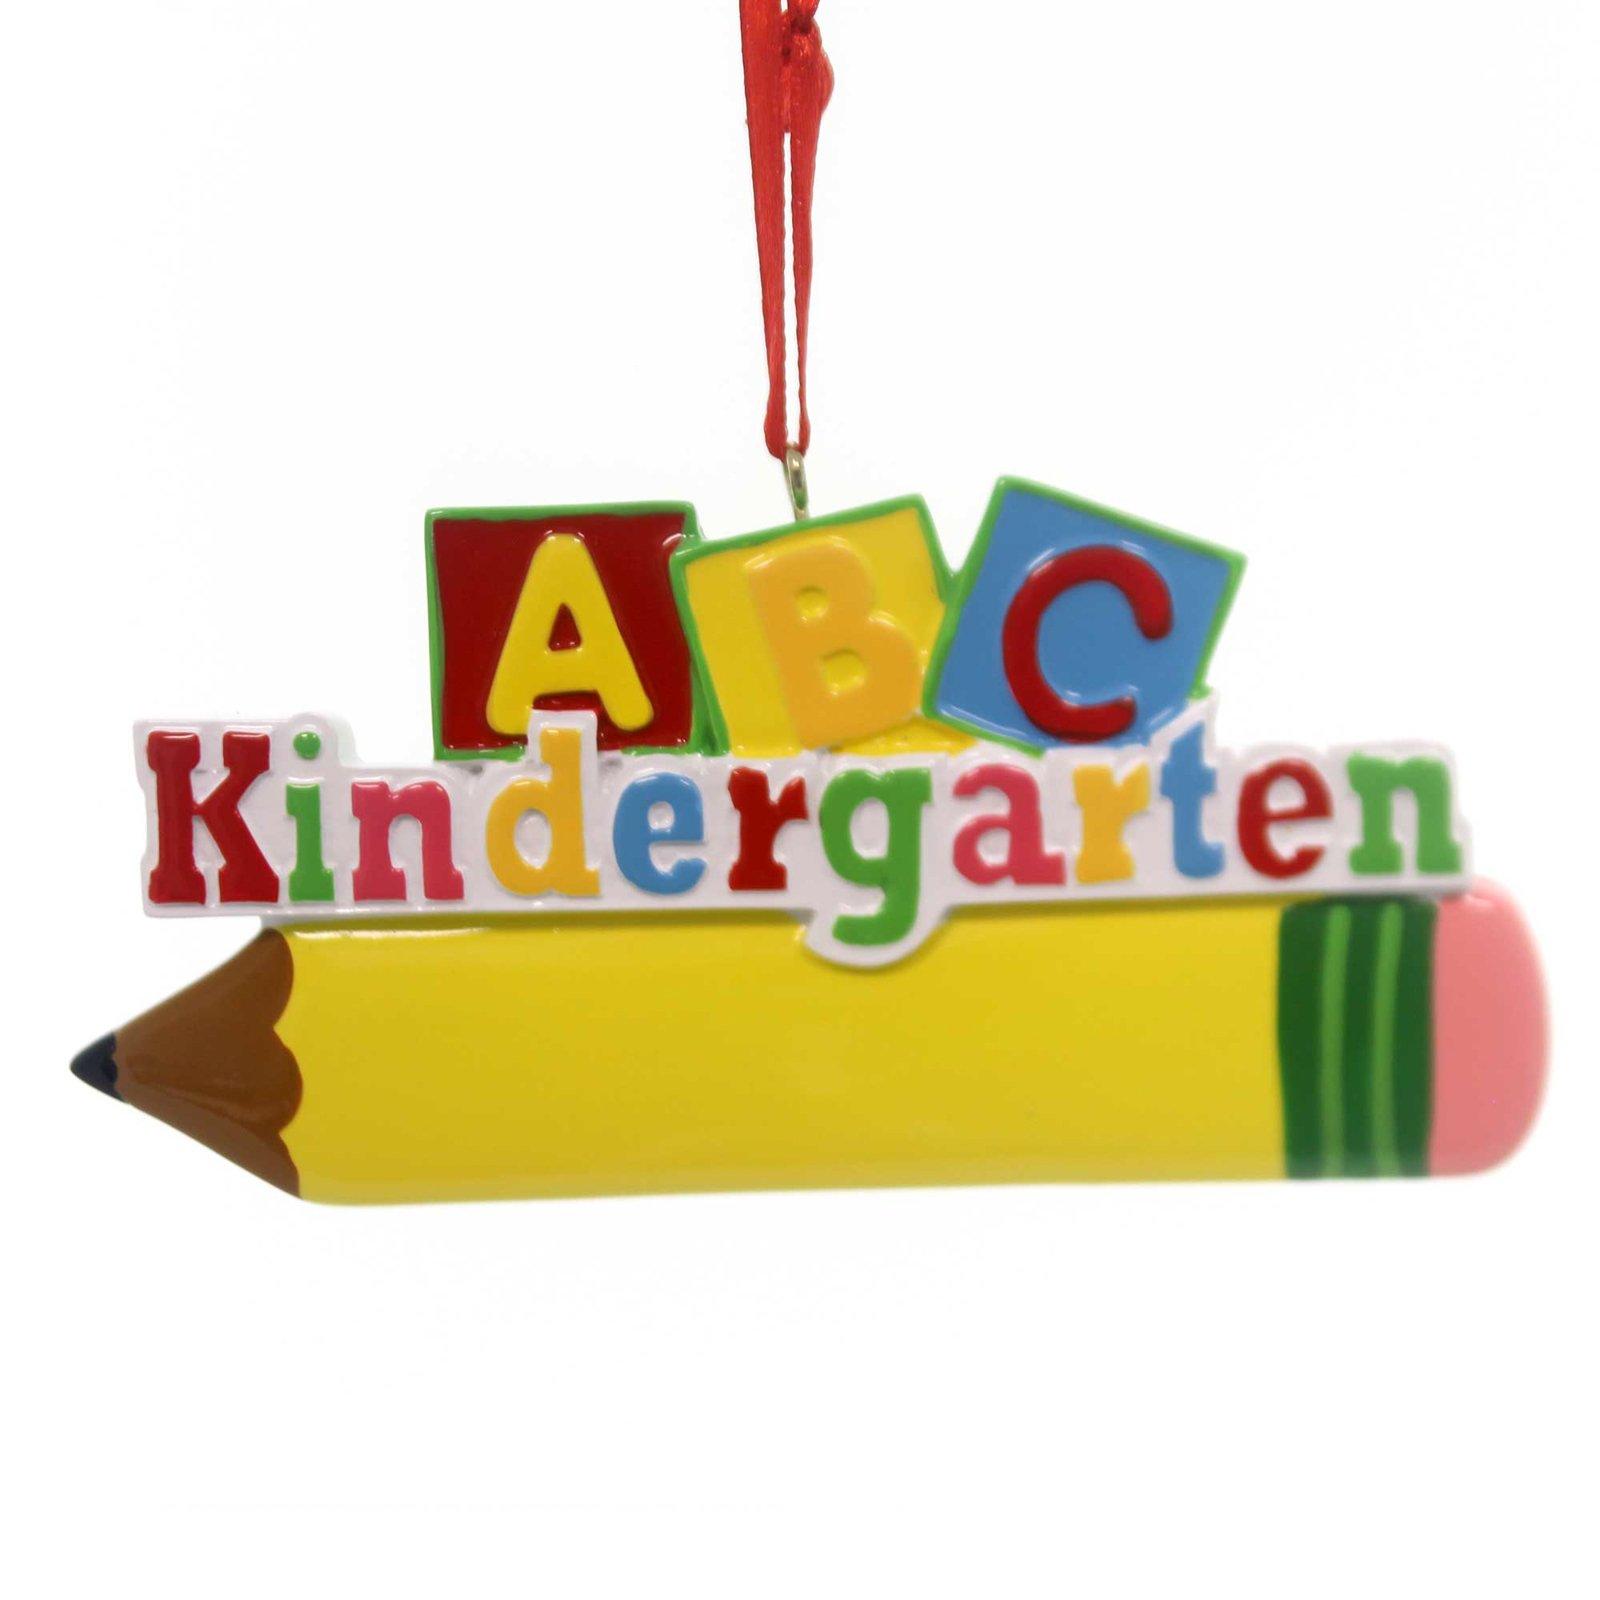 ABC Kindergarten Pencil Ornament